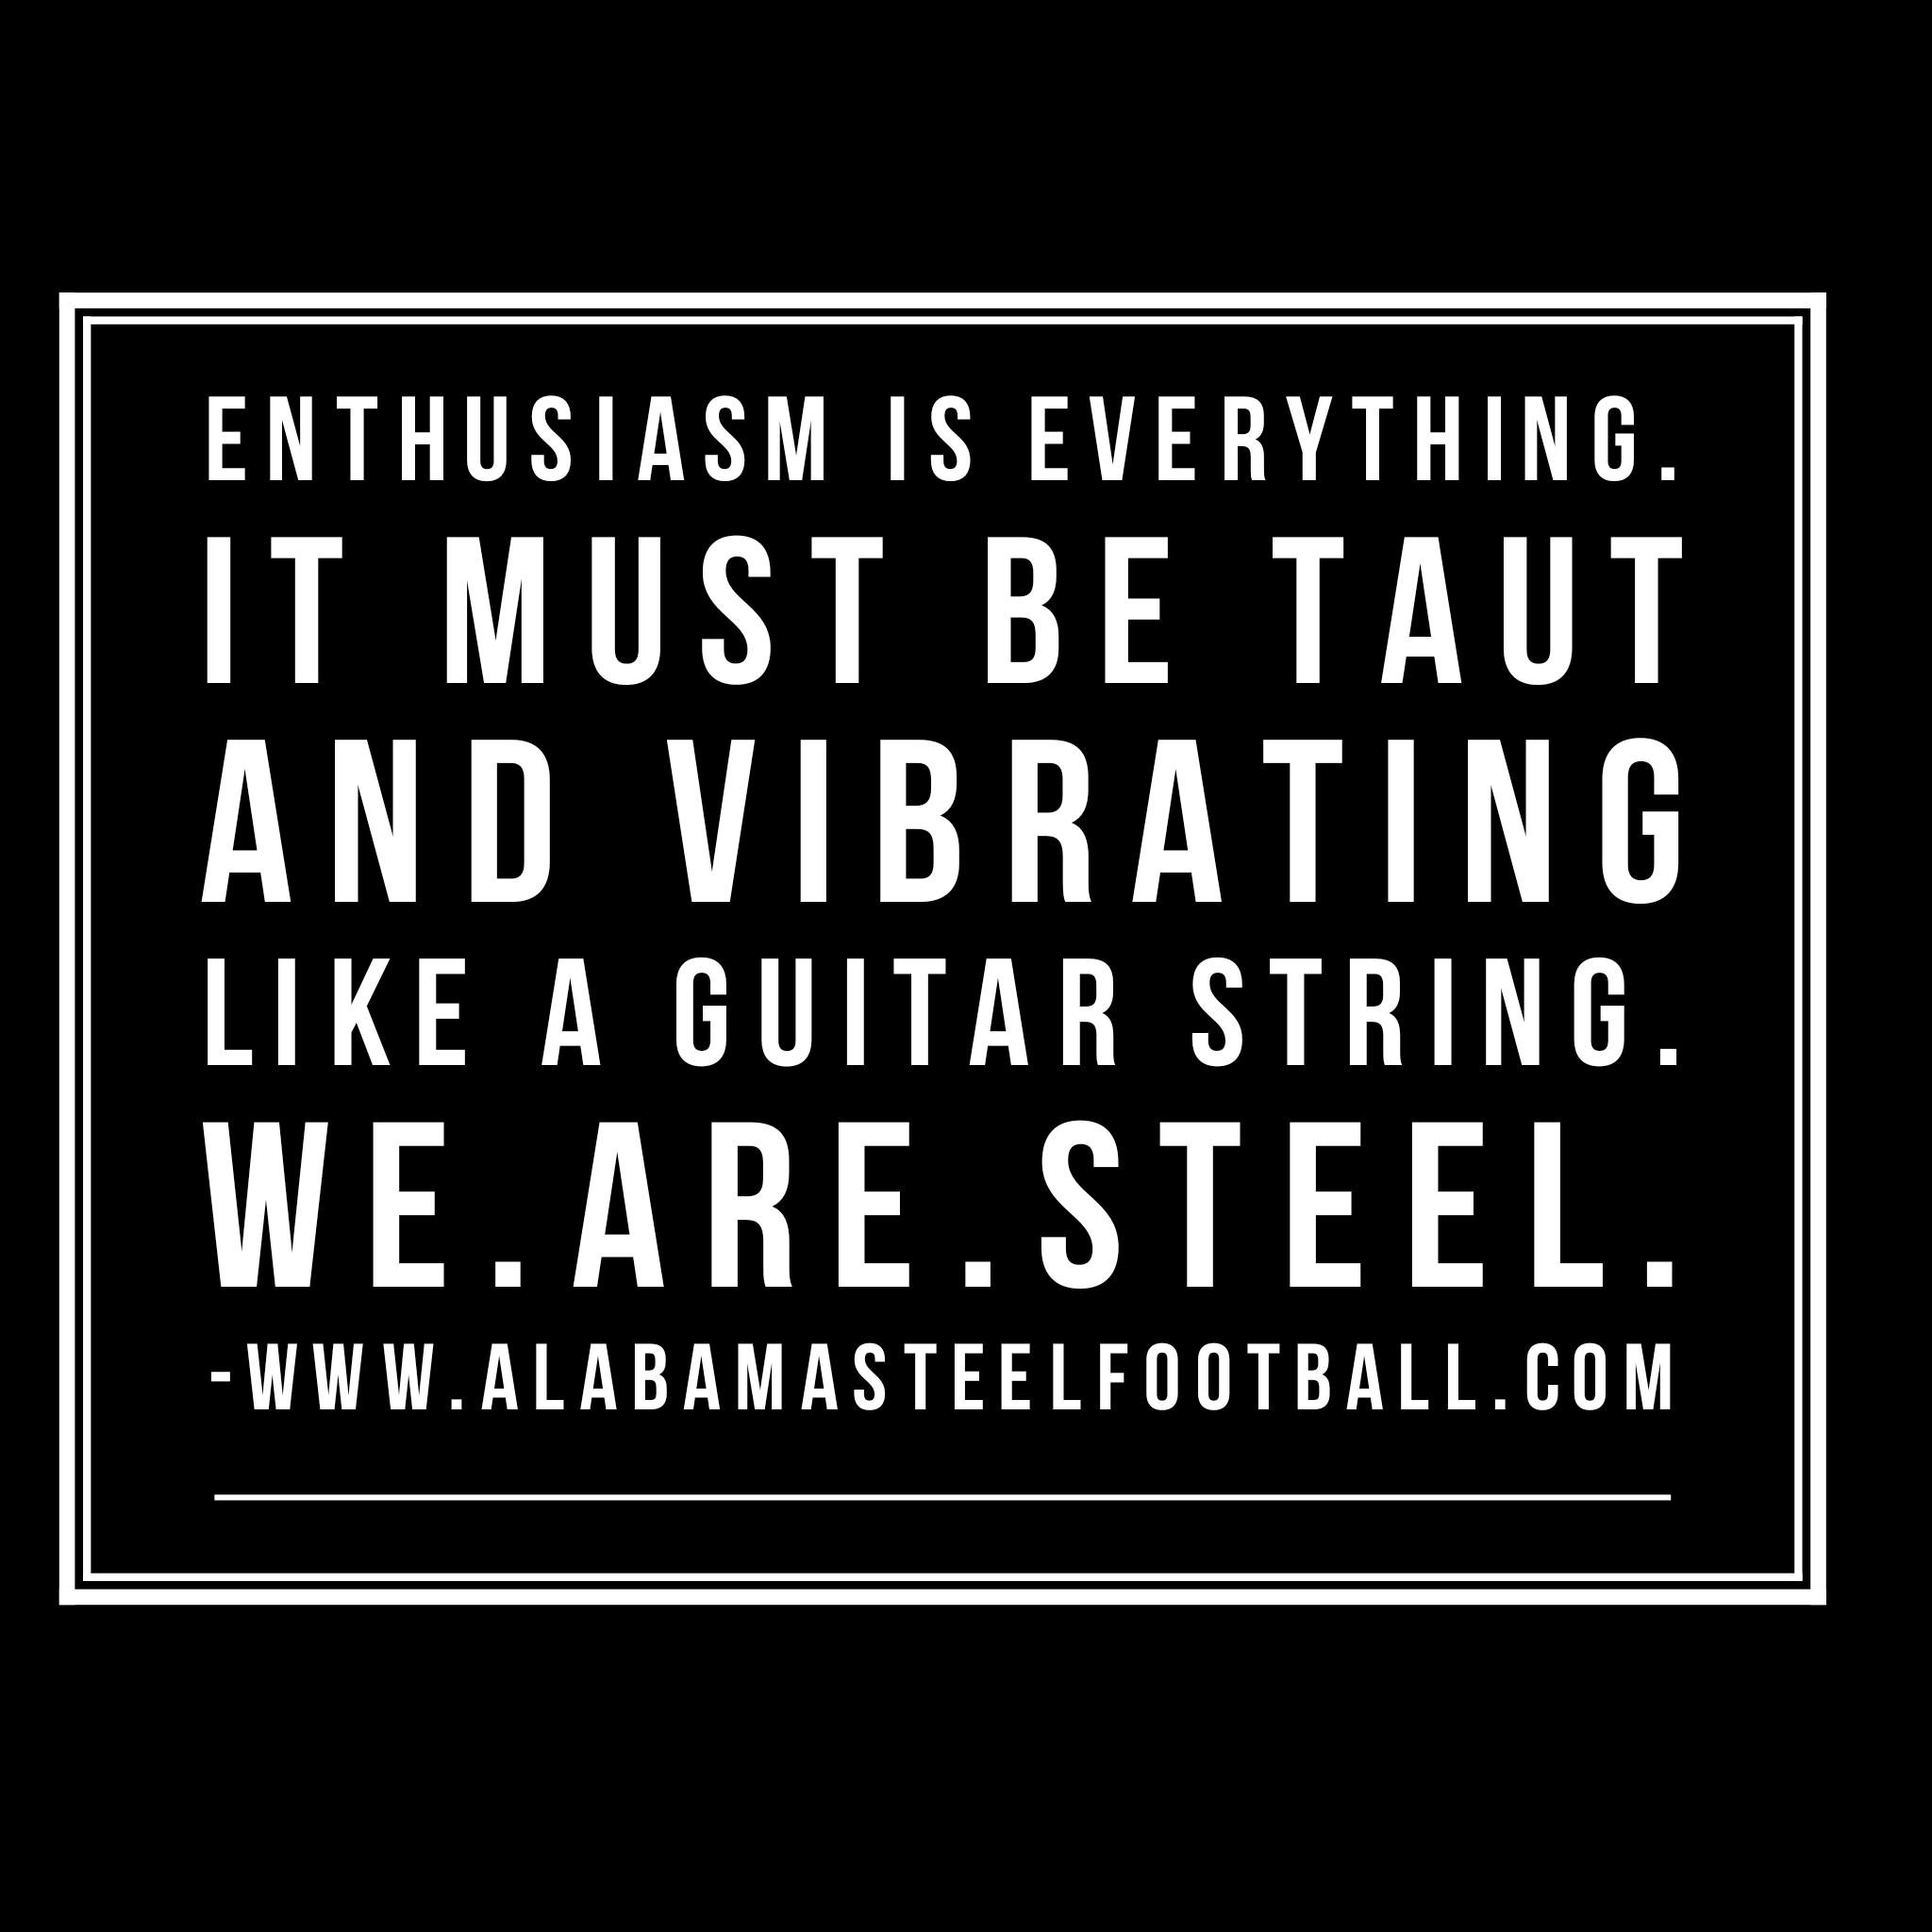 ENTHUSIASM IS EVERYTHING.jpg